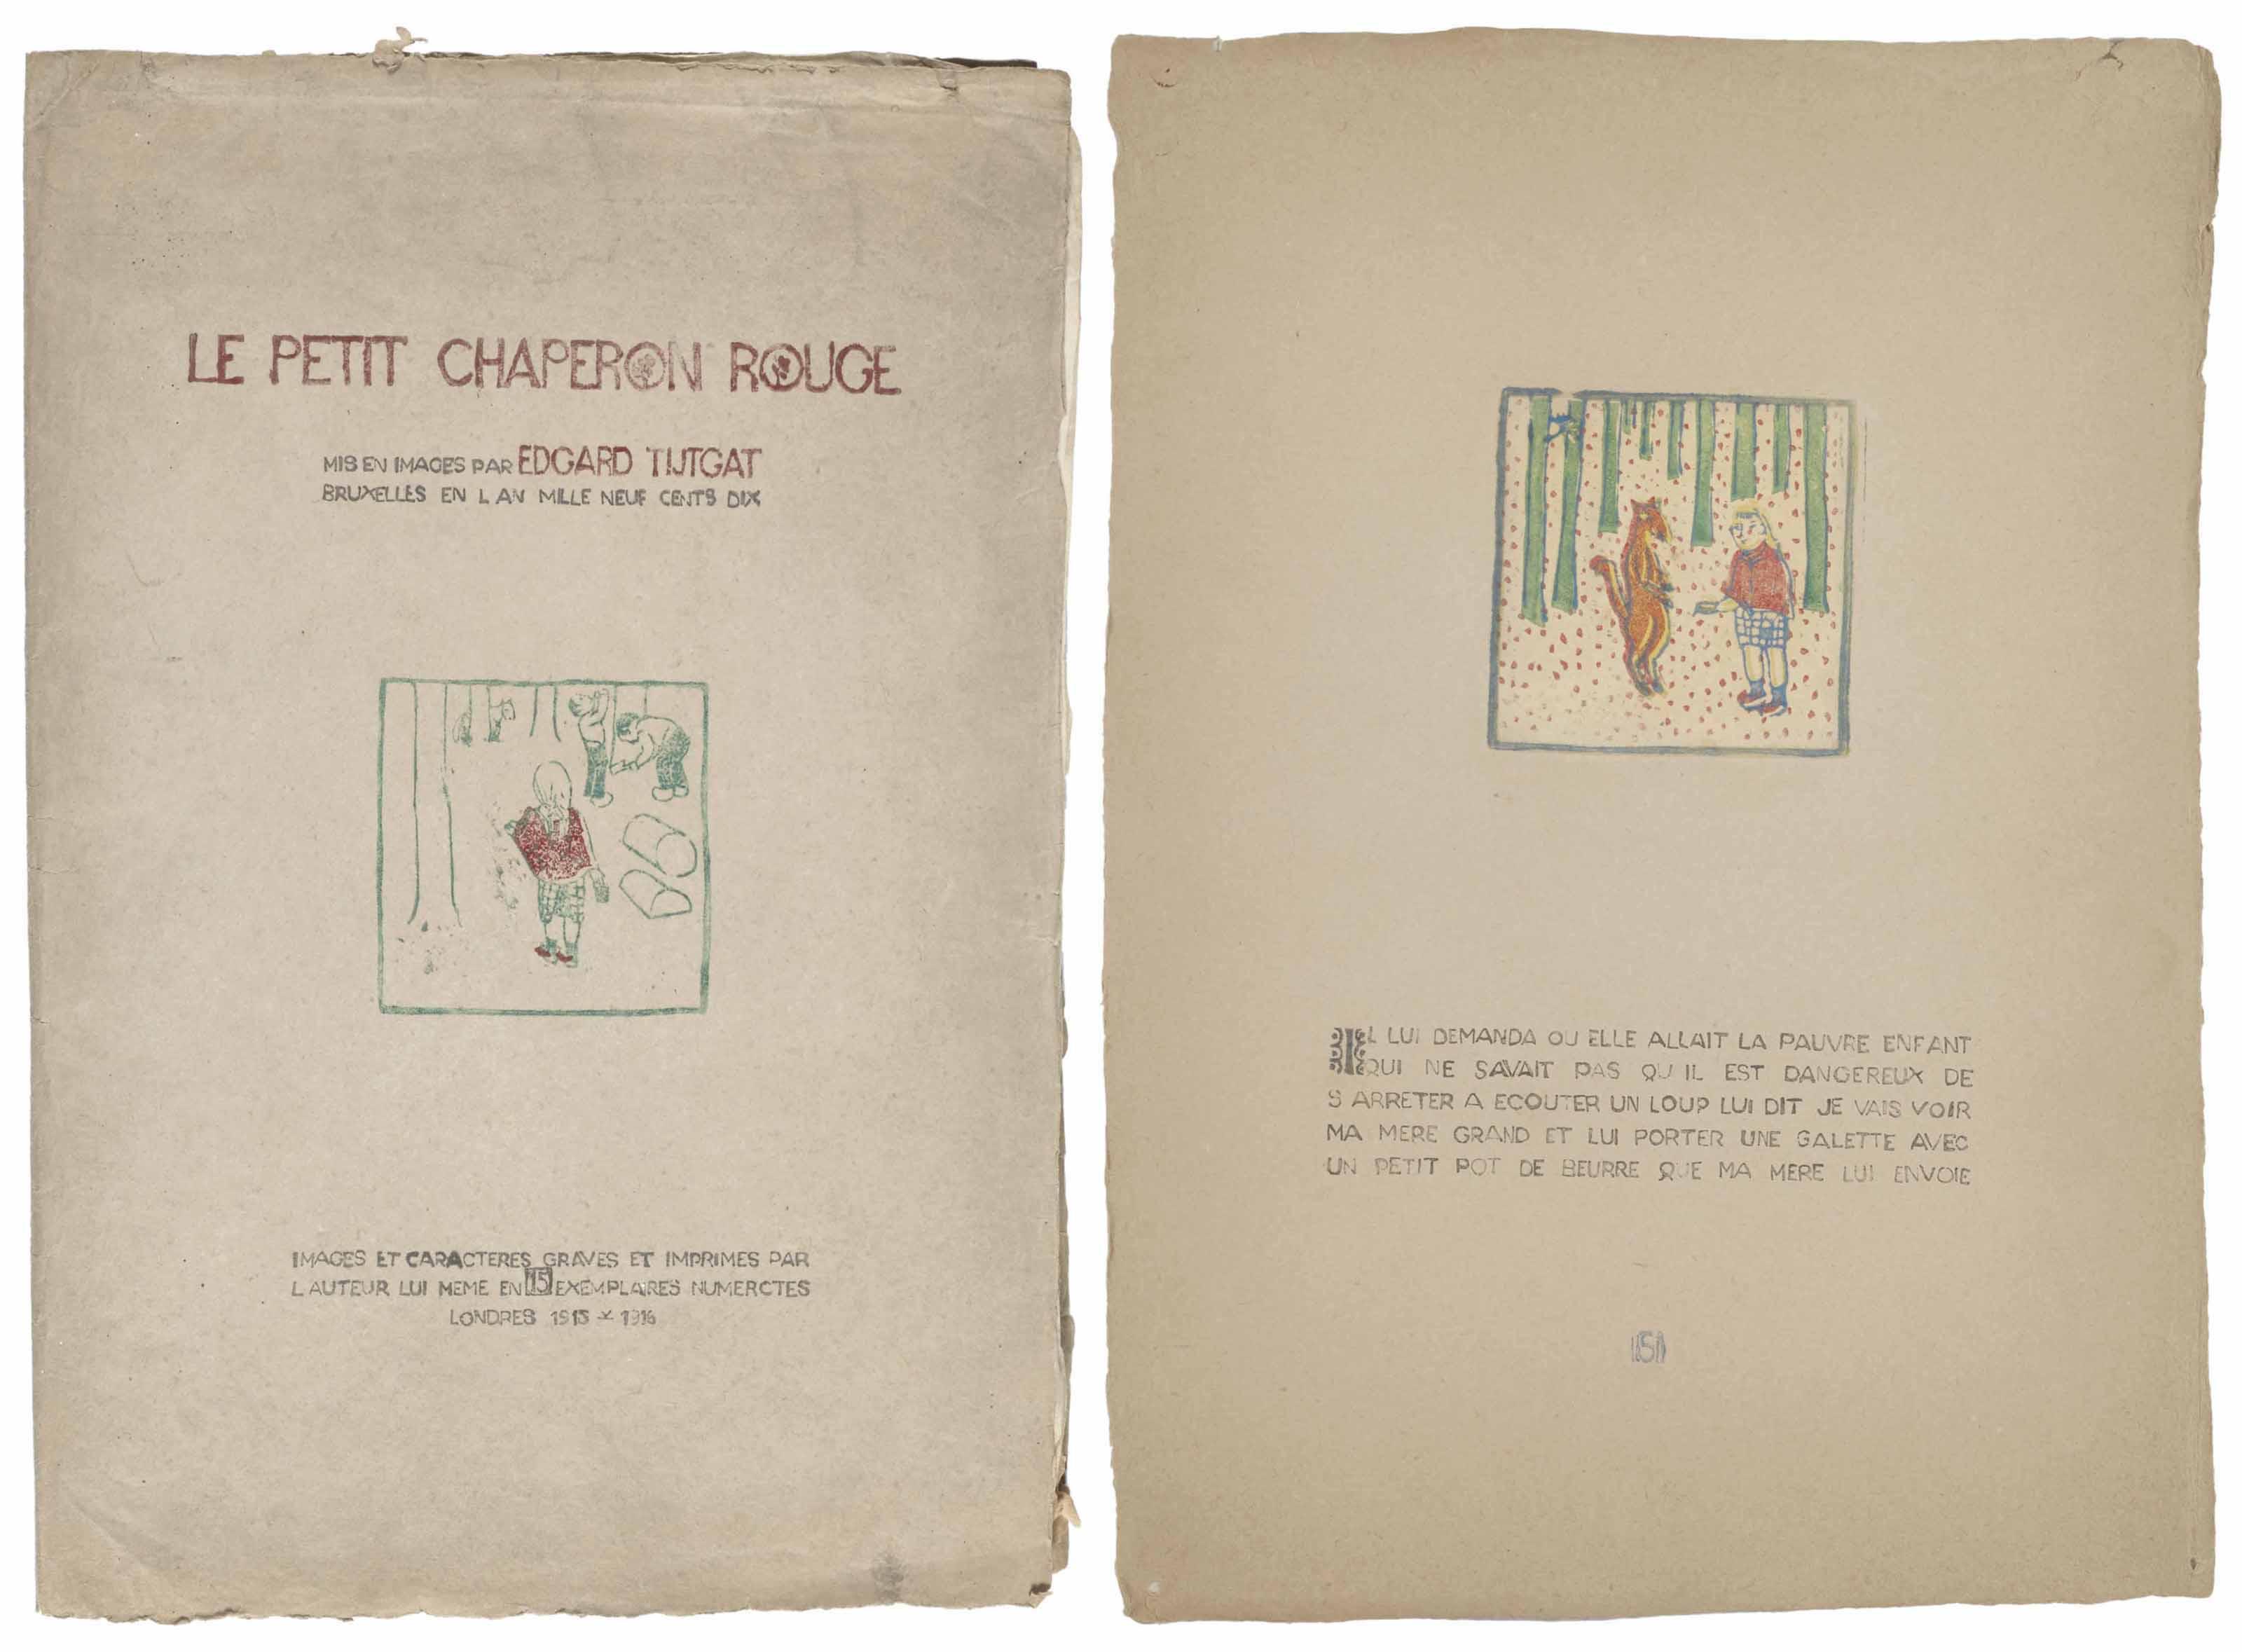 [TIJTGAT, Edgard (1879 – 1957)] - PERRAULT, Charles (1628 – 1703). Le Petit Chaperon Rouge. Londres, 1917.